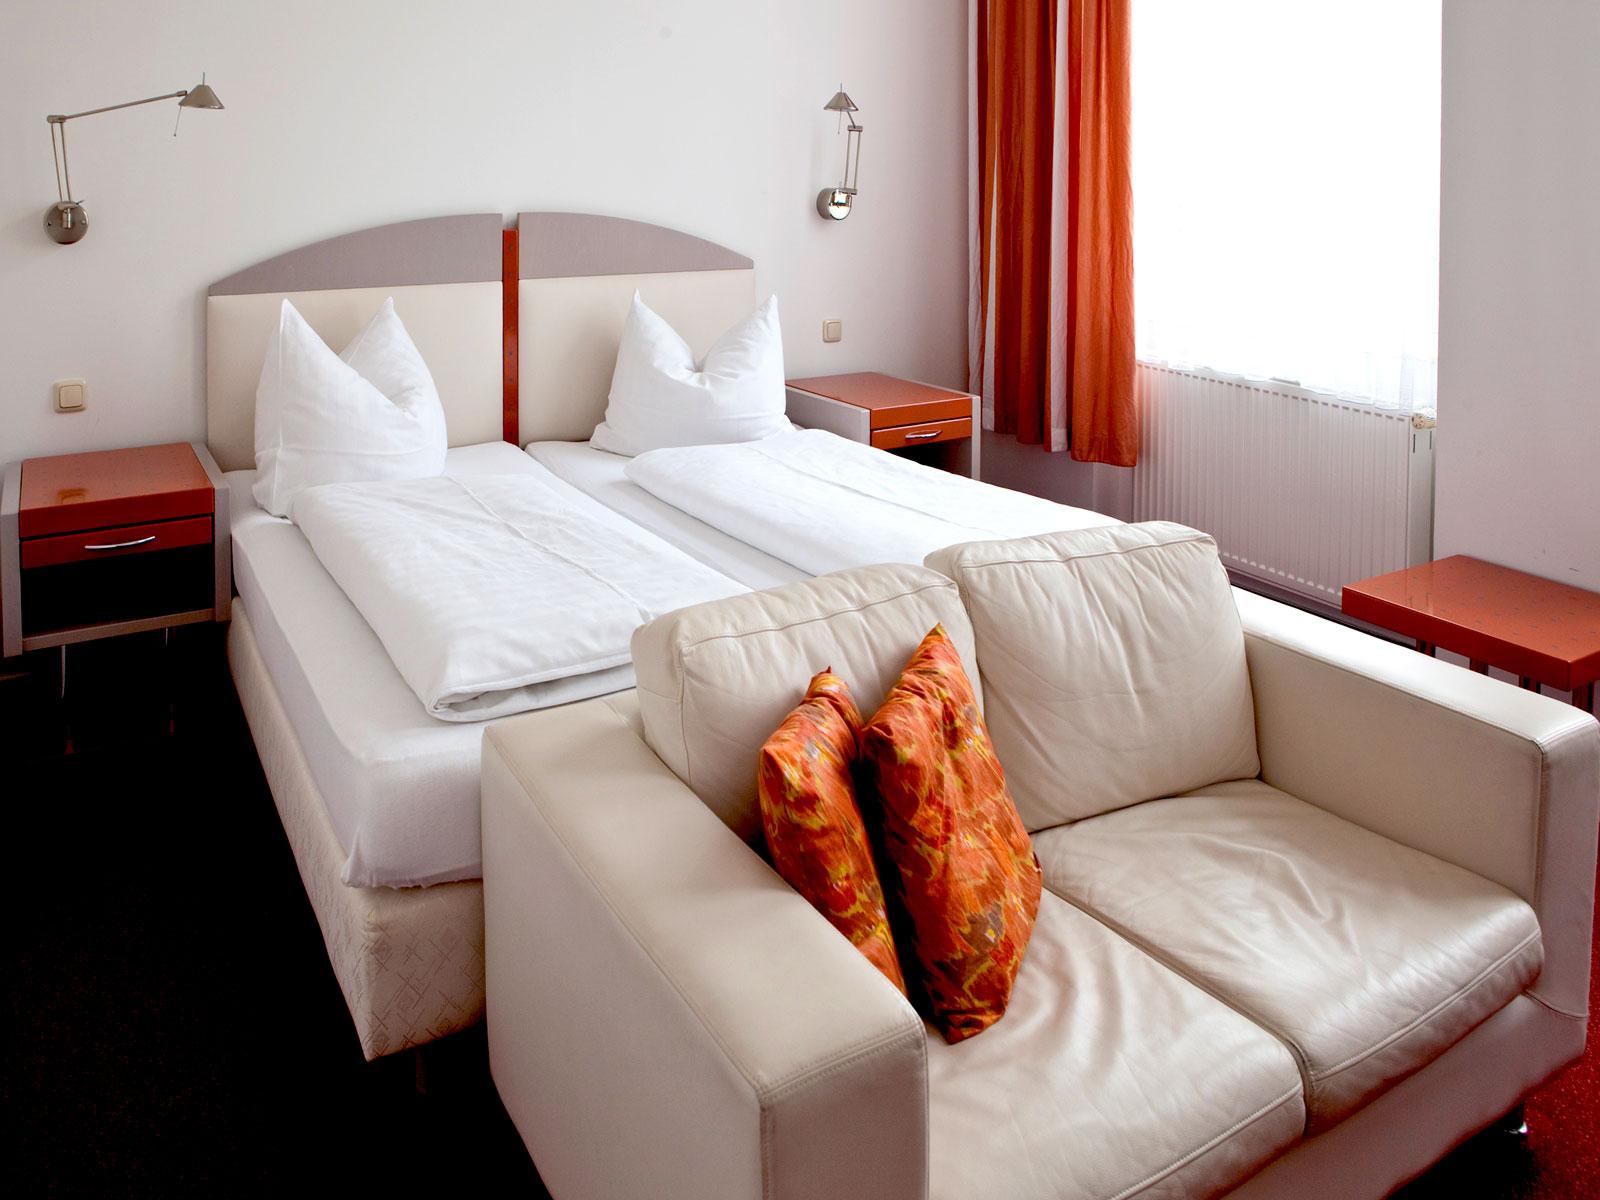 abl/hotel-adler-garni-greifswald-doppelbettzimmer.jpg